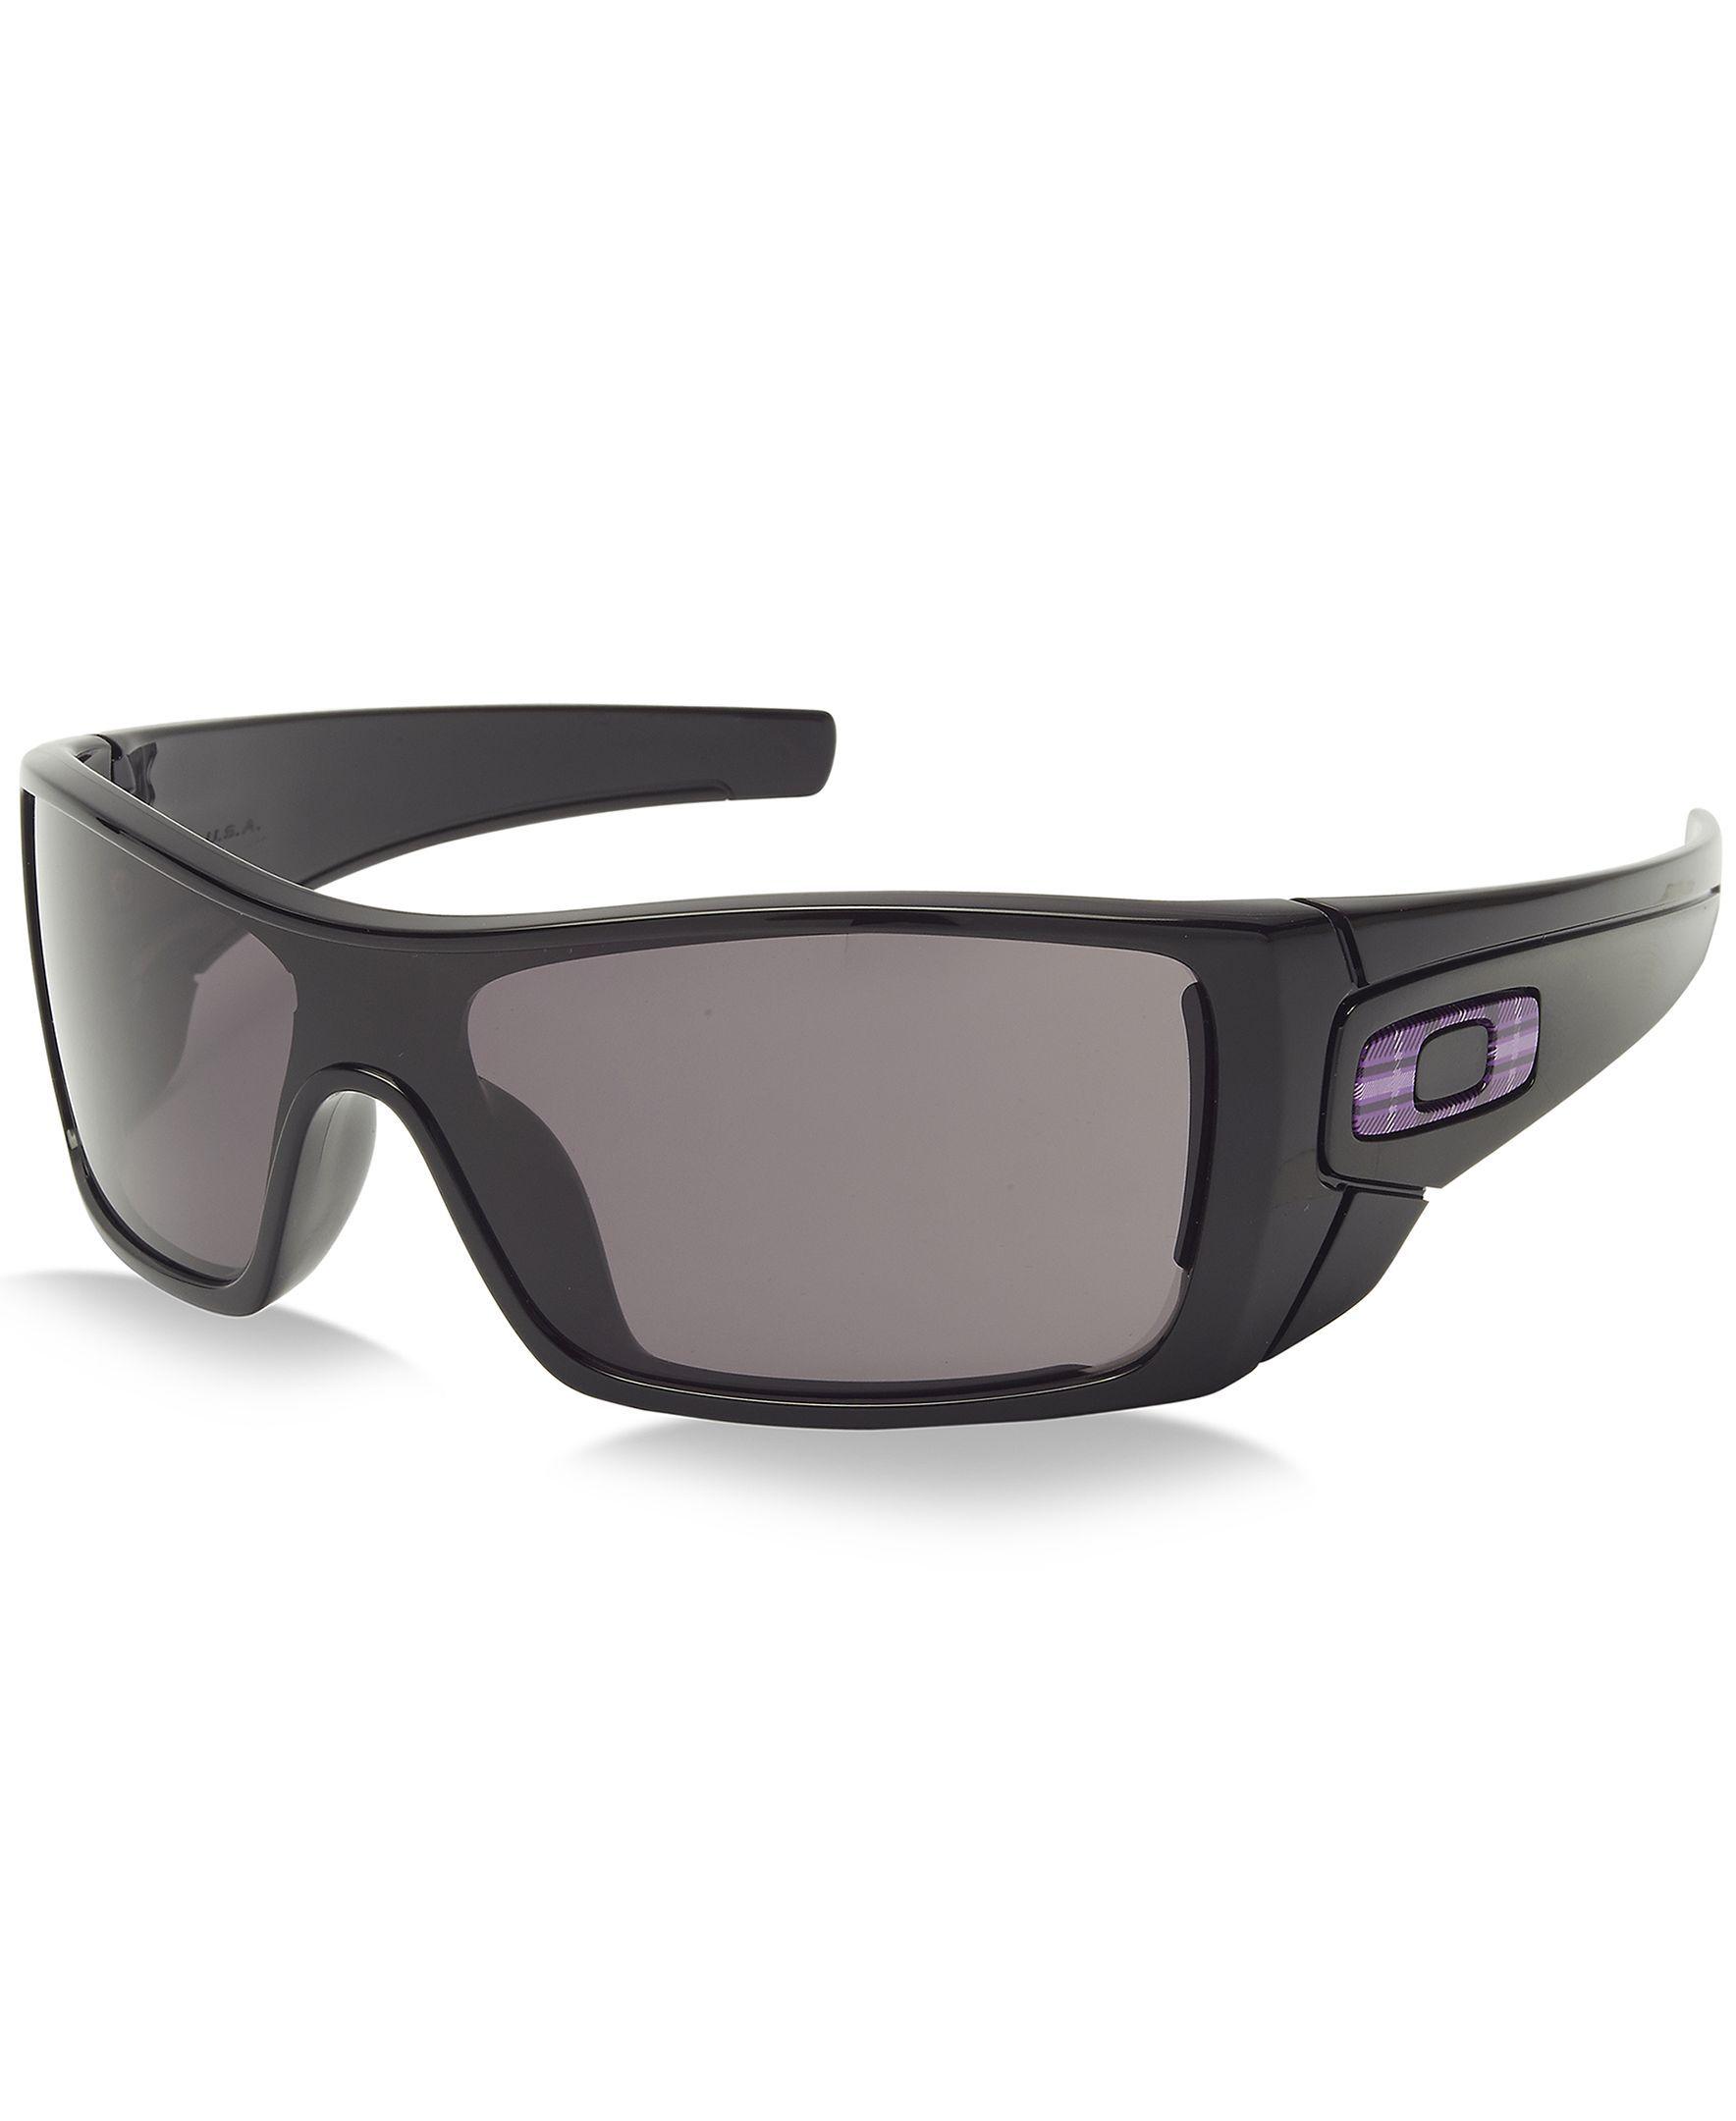 Oakley Sunglasses, Oakley   GAFAS DE SOL   Pinterest   Lentes, Gafas ...